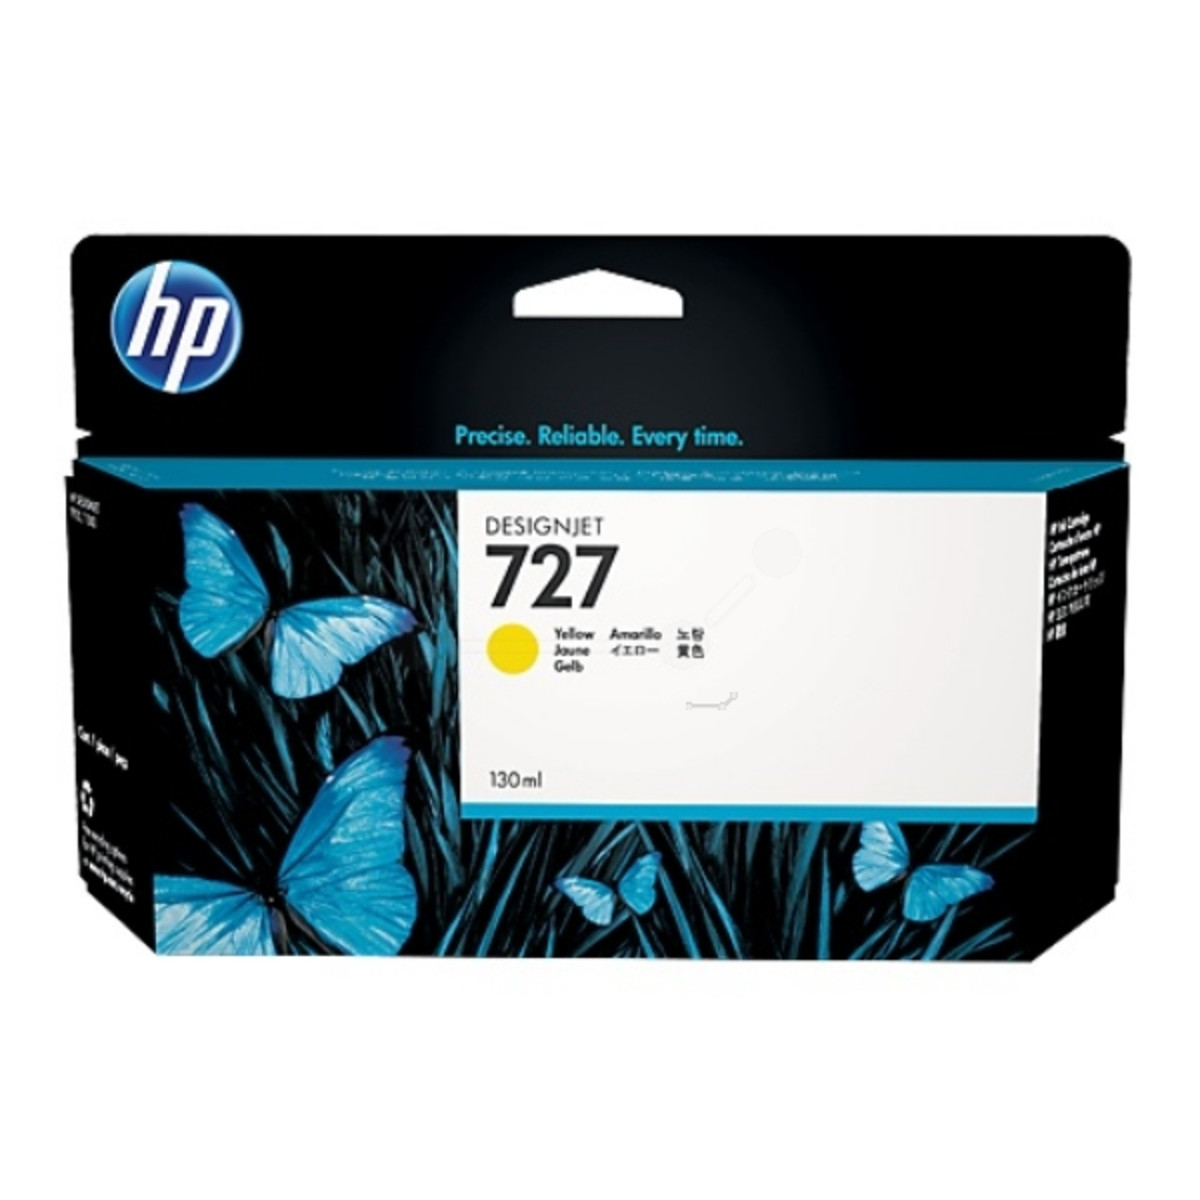 HP 727 (B3P21A) Yellow Ink Cartridge - 130ml